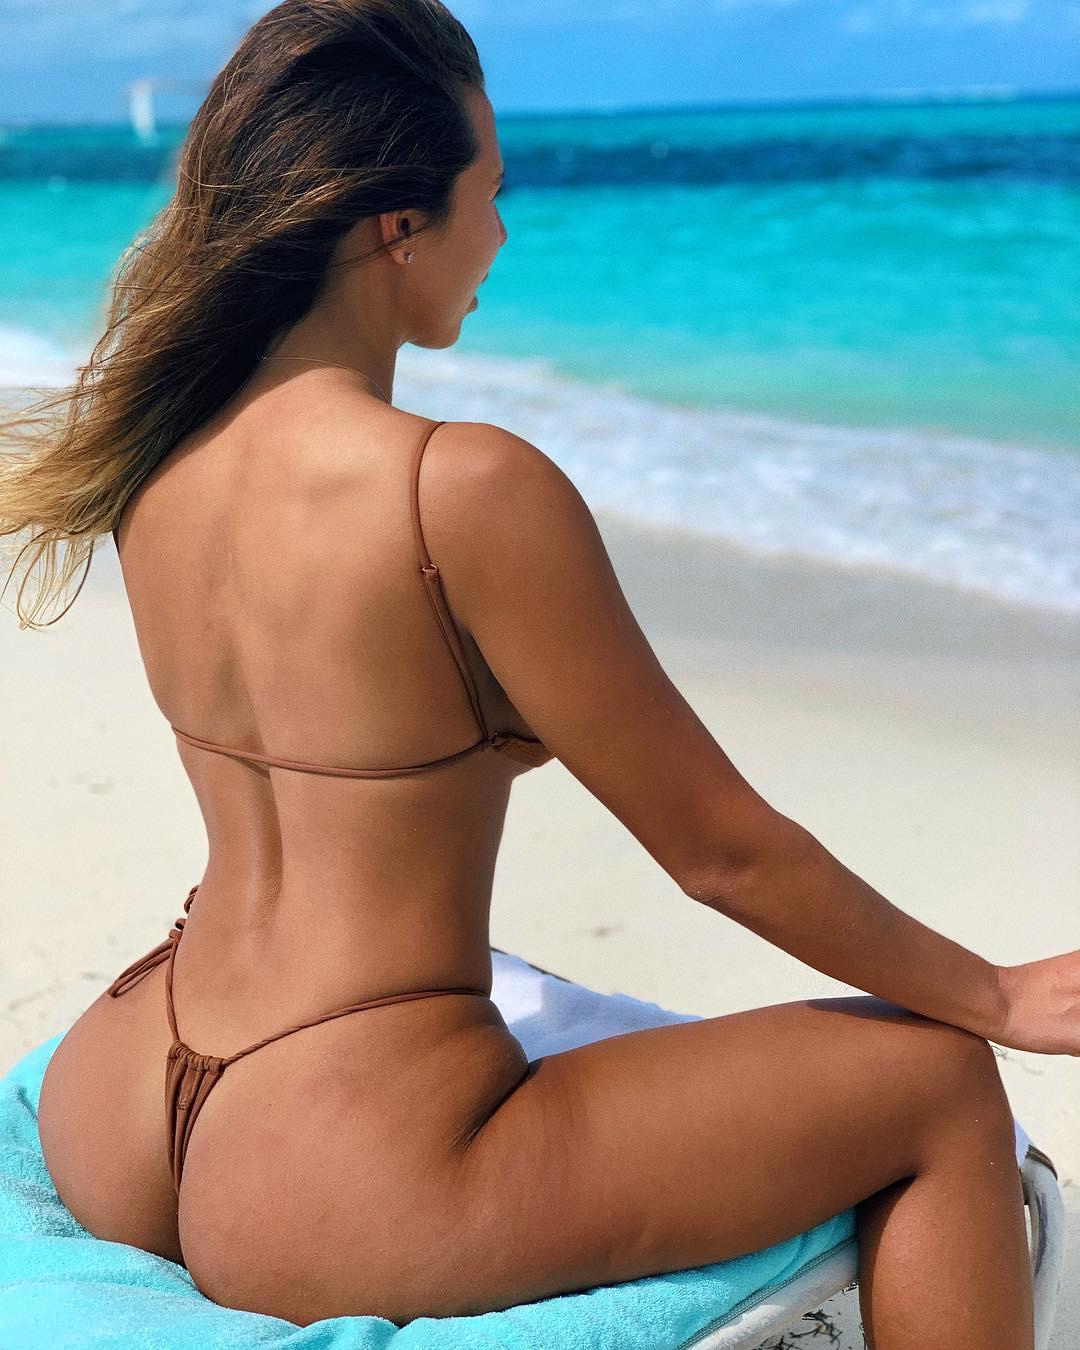 Natalia Garibotto Nude Onlyfans Leaked 0004